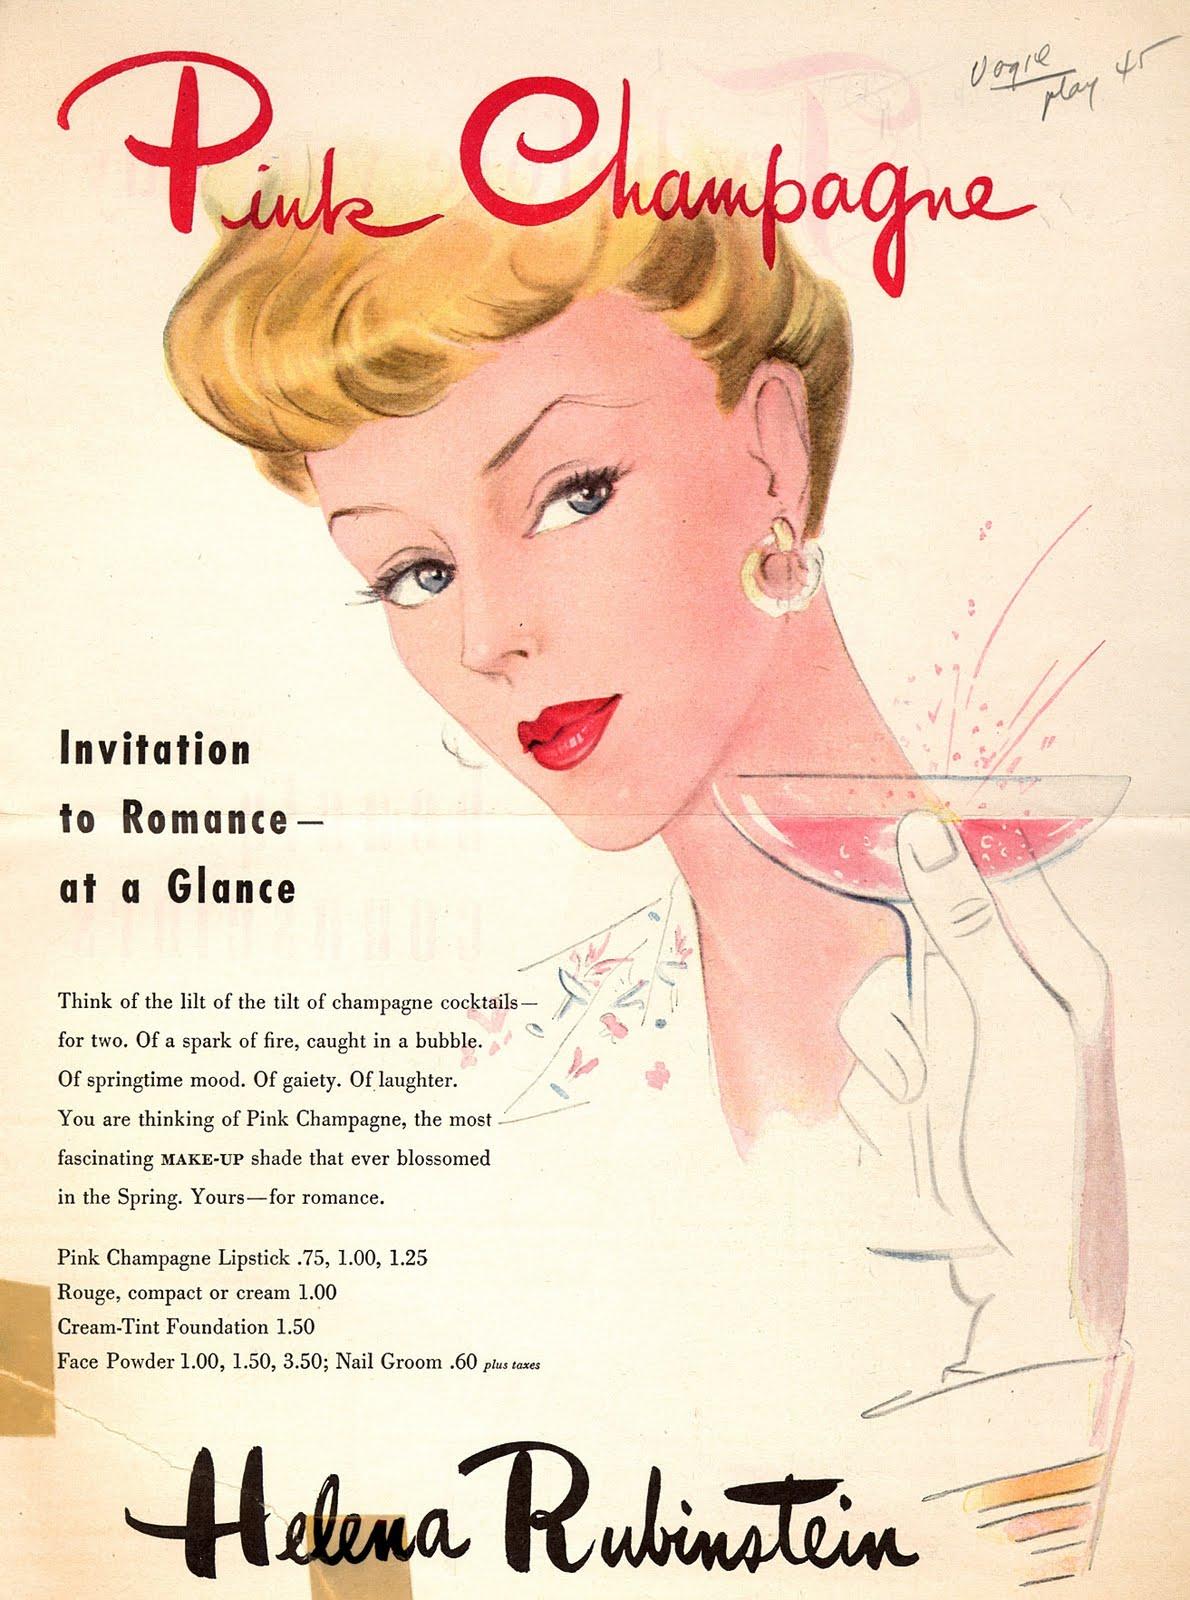 helena rubinstein makeup-1 - The Bowery Boys: New York City